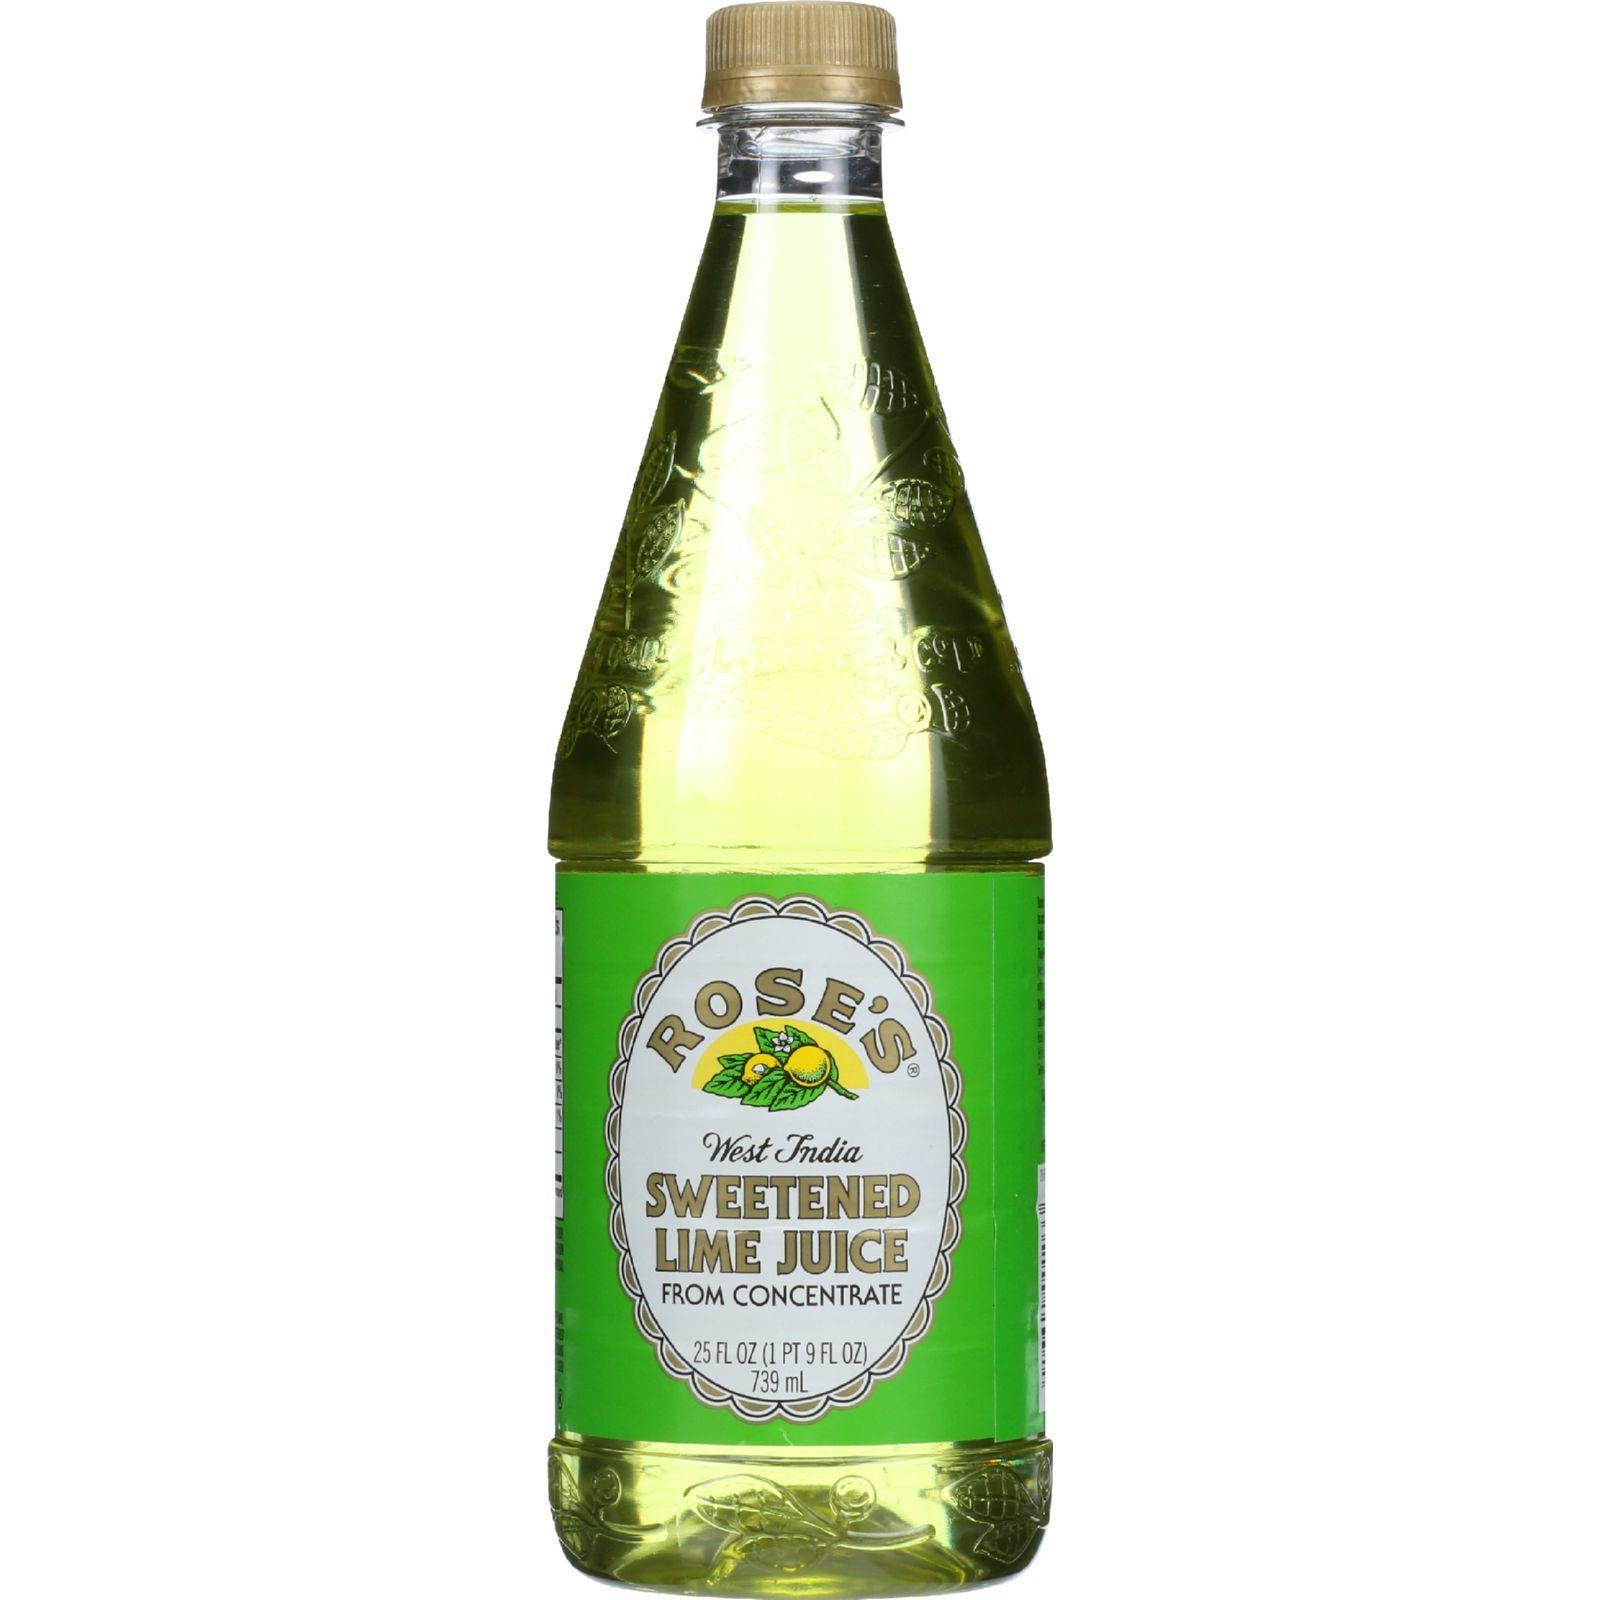 Roses Juice - Sweetened Lime - 25 oz - case of 12